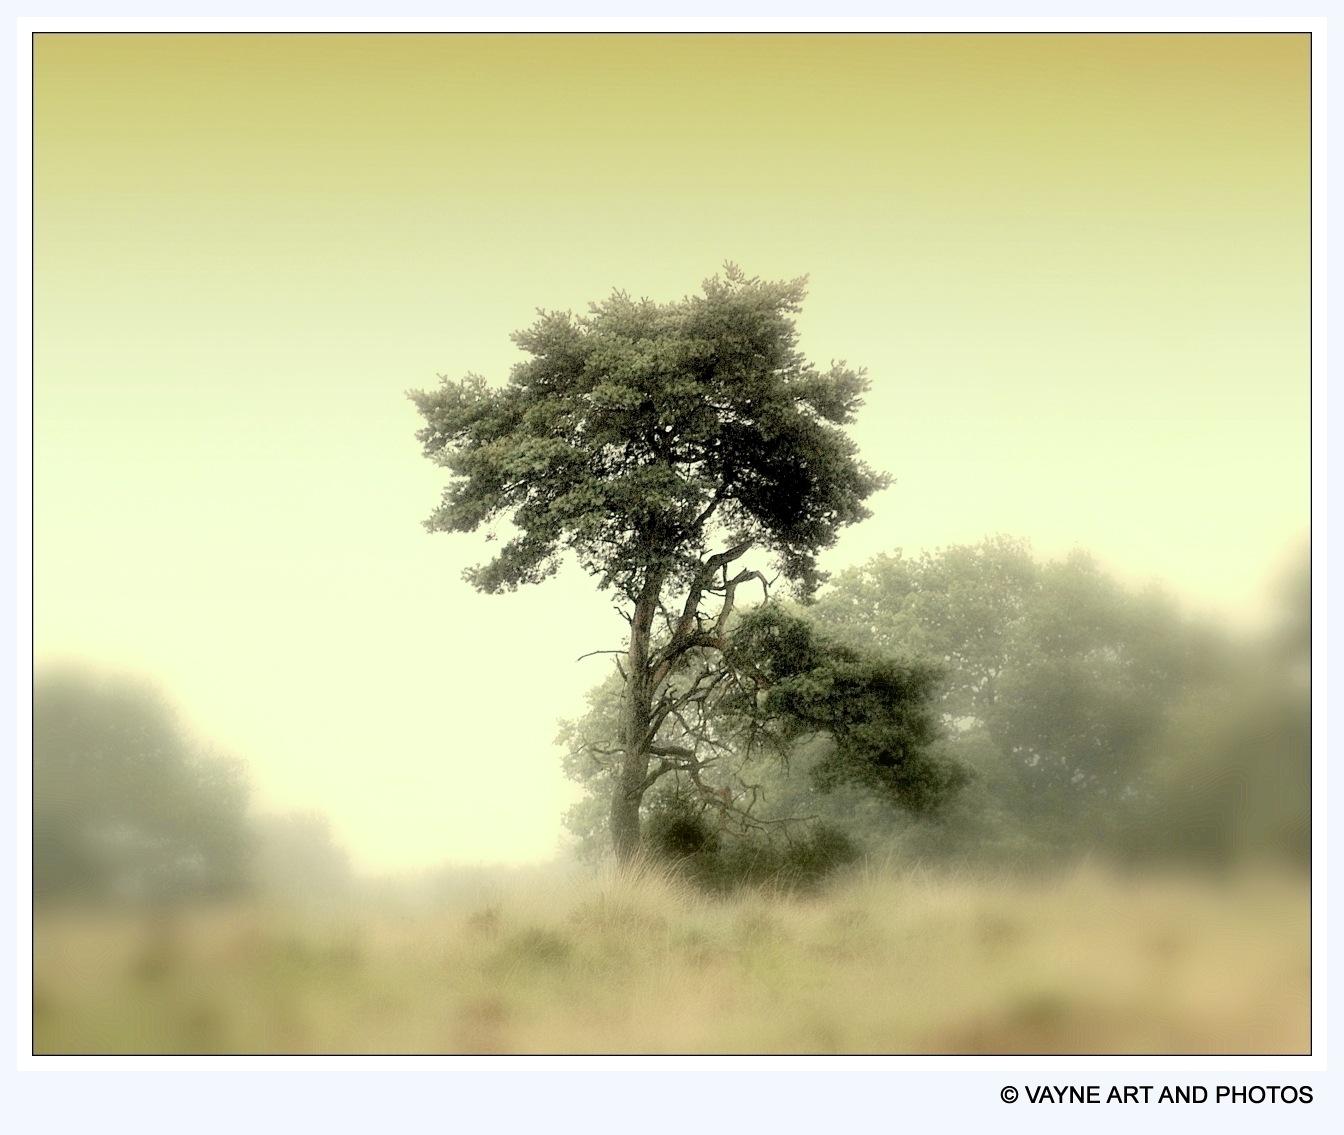 On the  woodborder by Jacob van der Veen